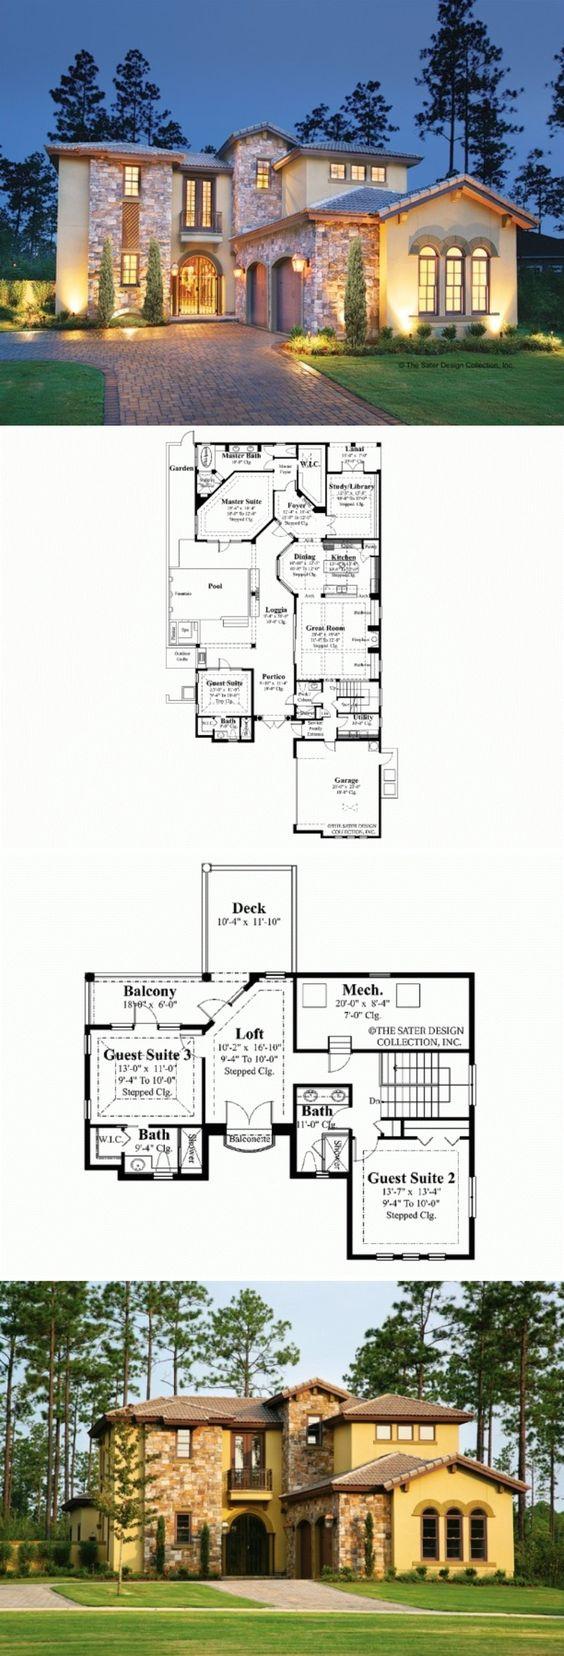 Mediterranean house plan hwepl13160 gentleman 39 s homes for Mediterranean floor plans with courtyard